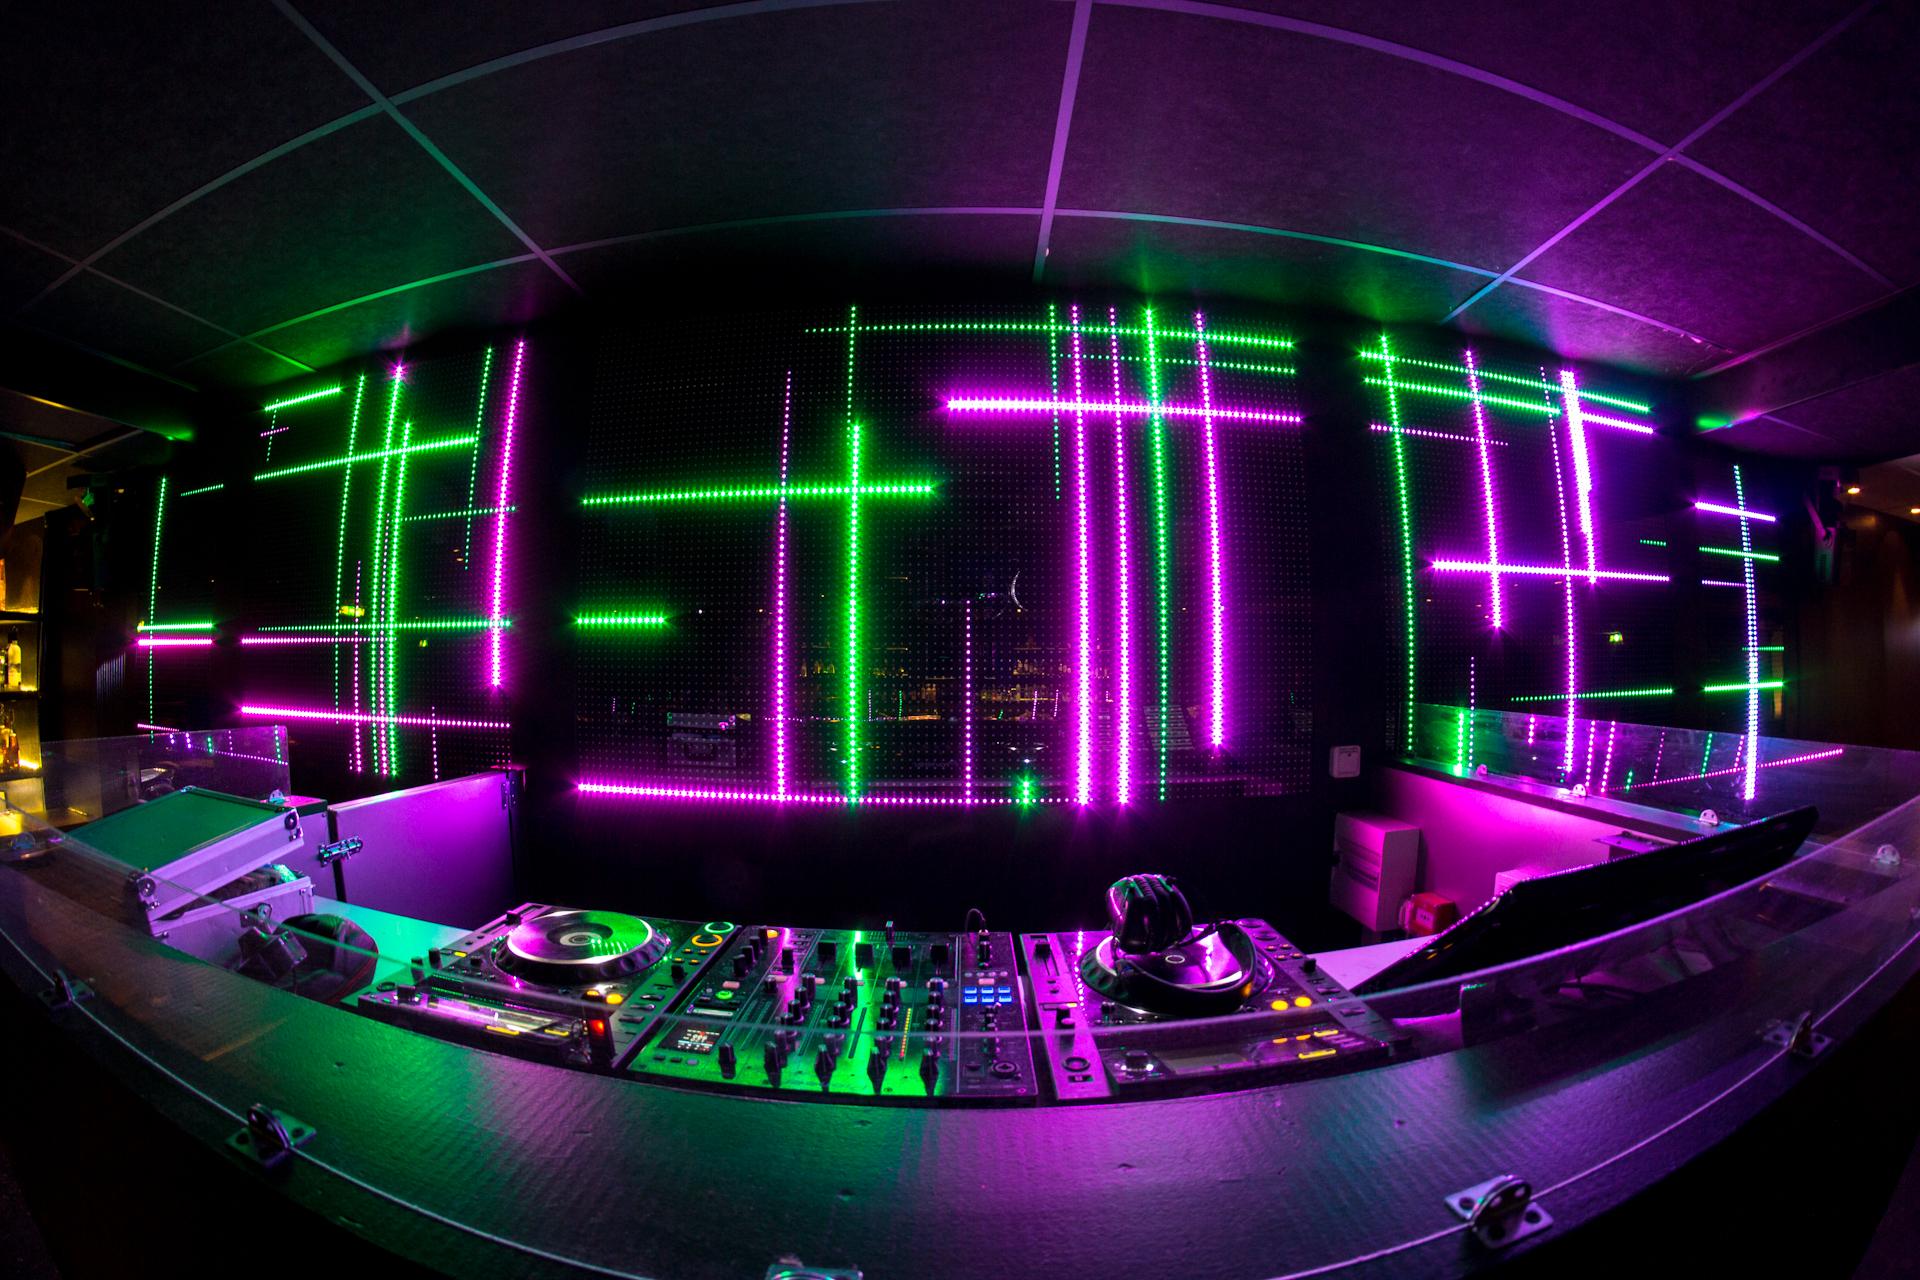 nightclub allover printed dj - HD1920×1280